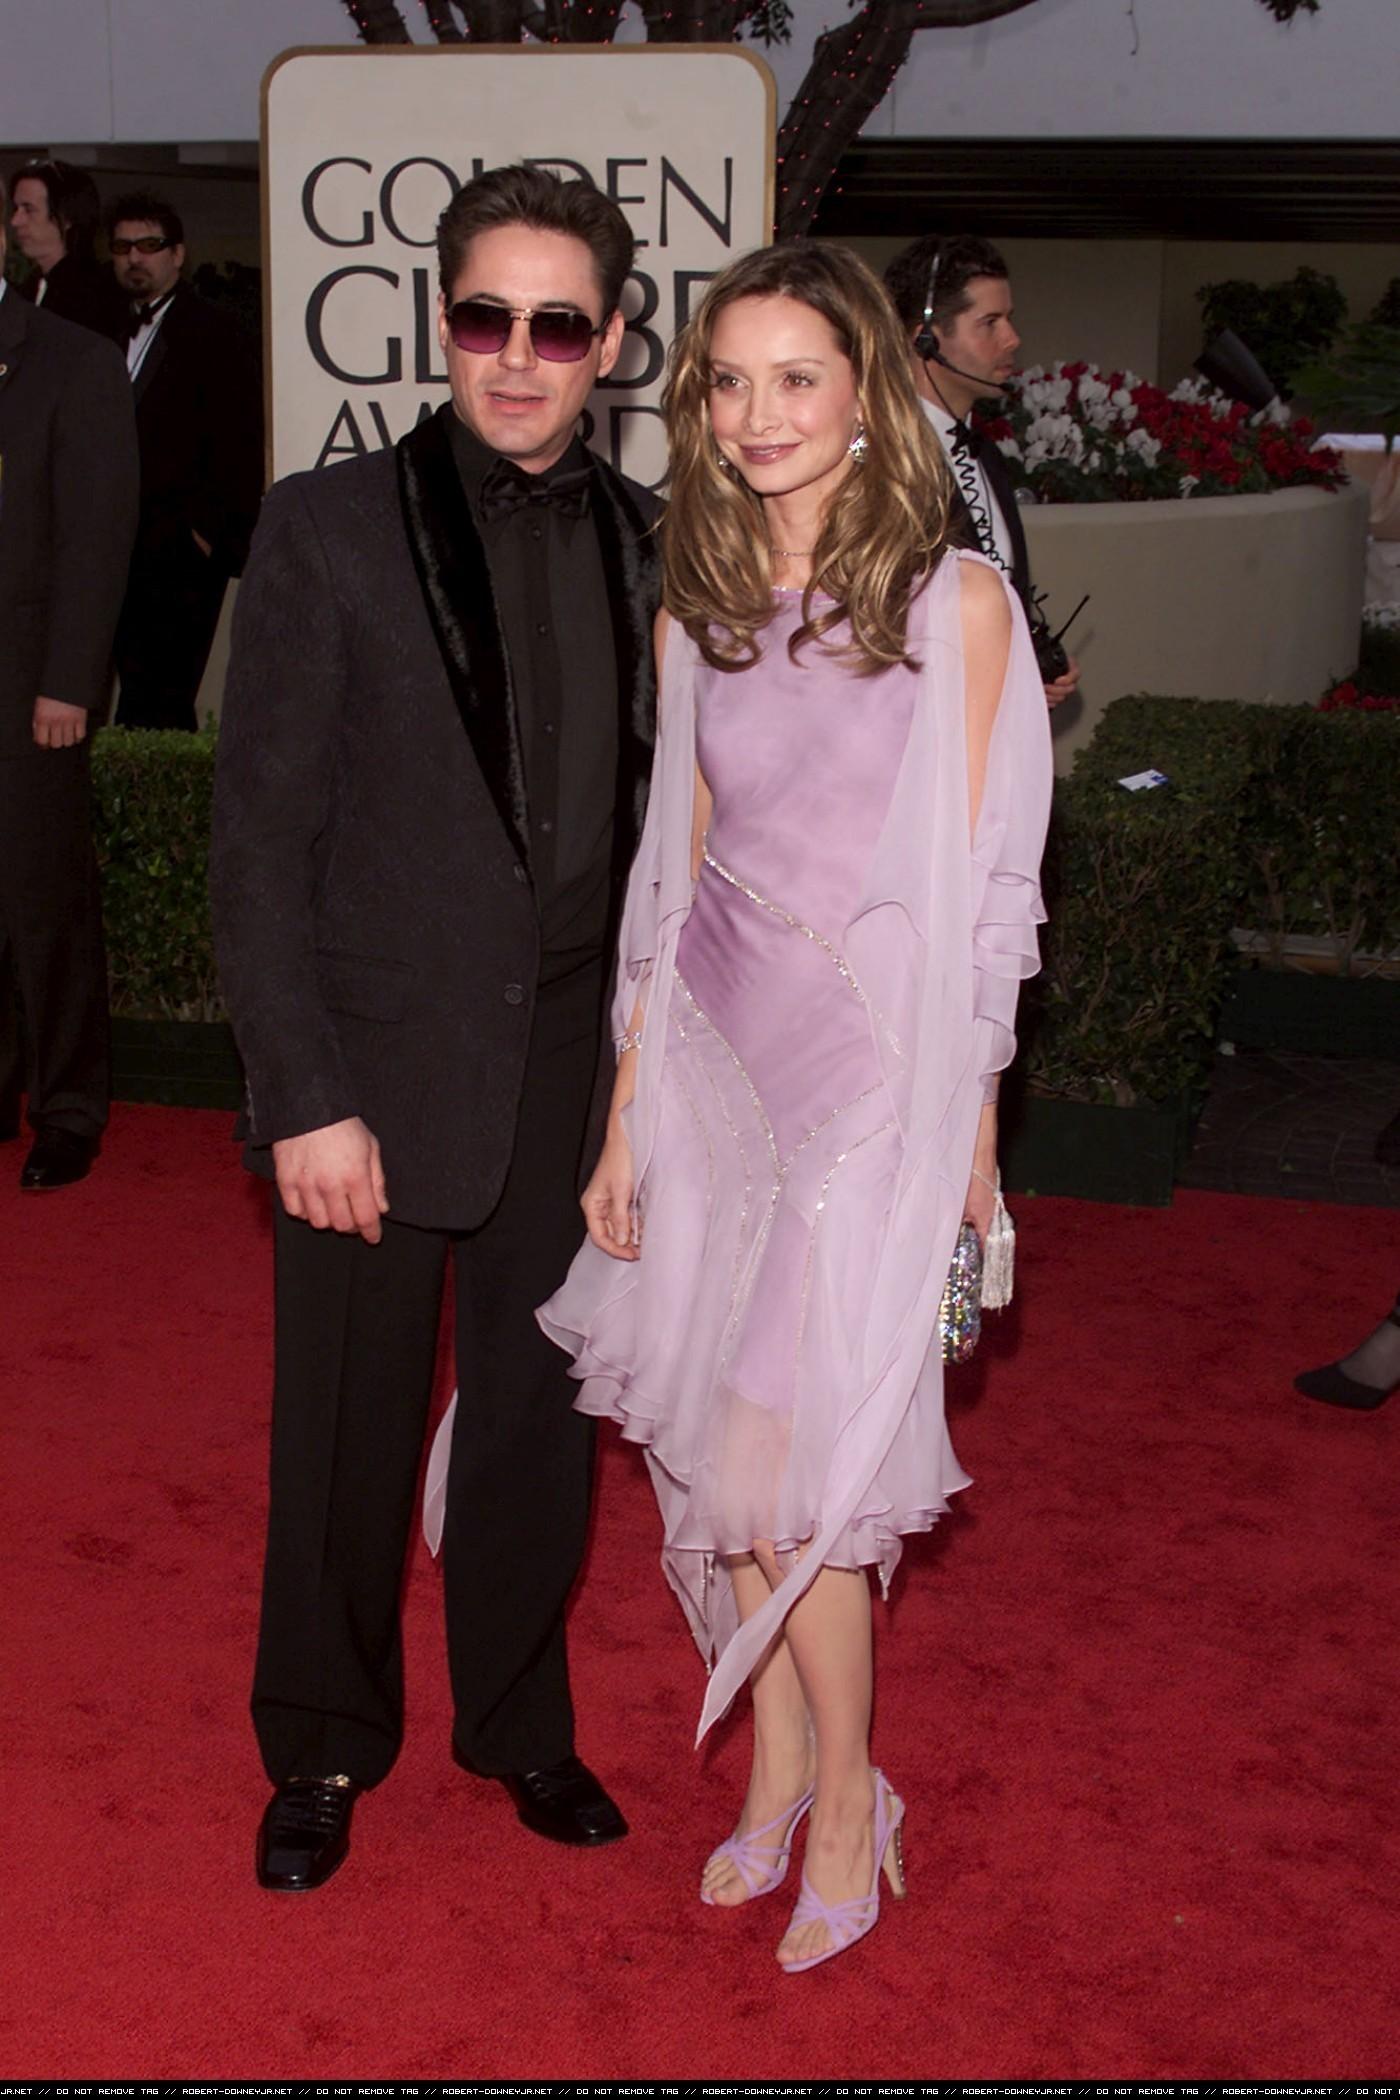 Golden Globe Awards - 21st January